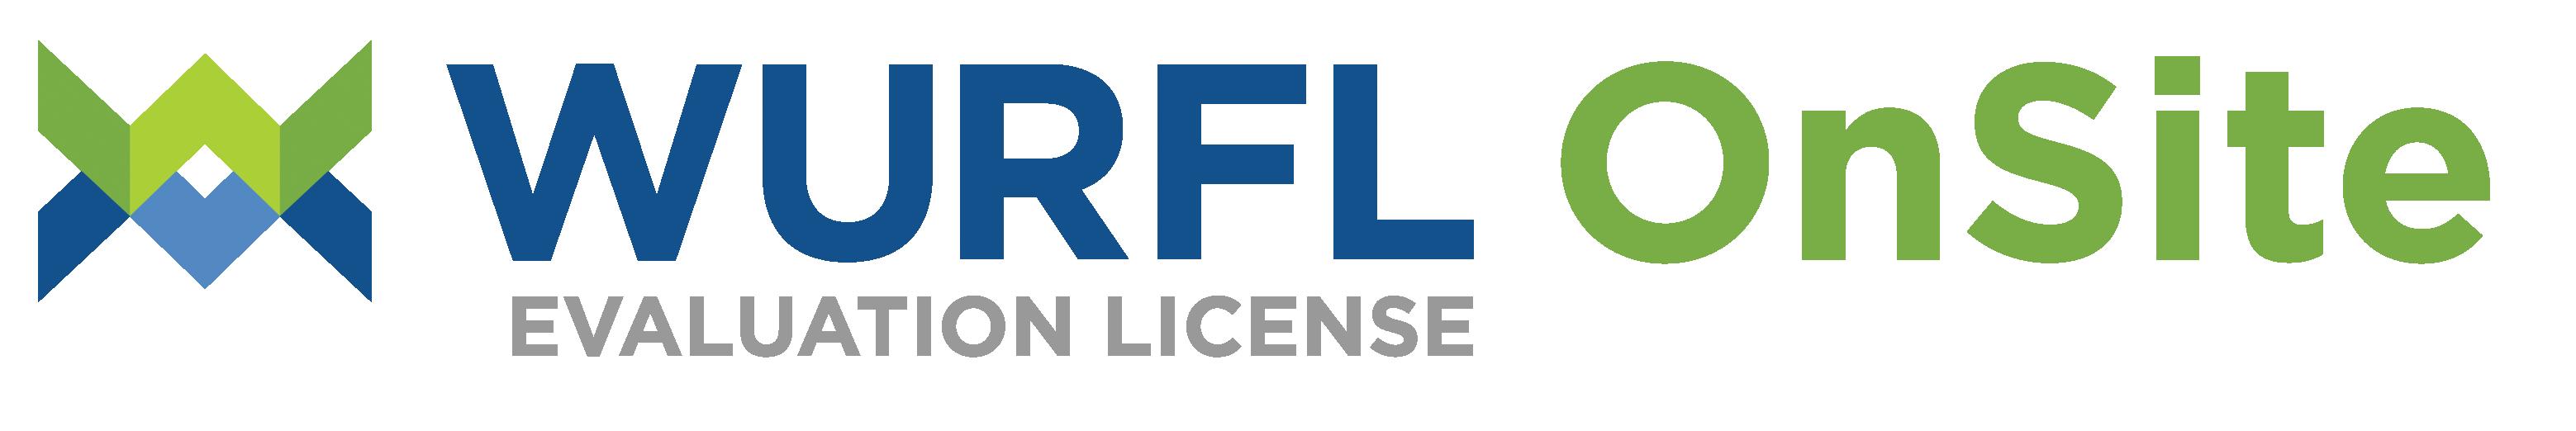 WURFLOnSite-WW-Evaluation-License